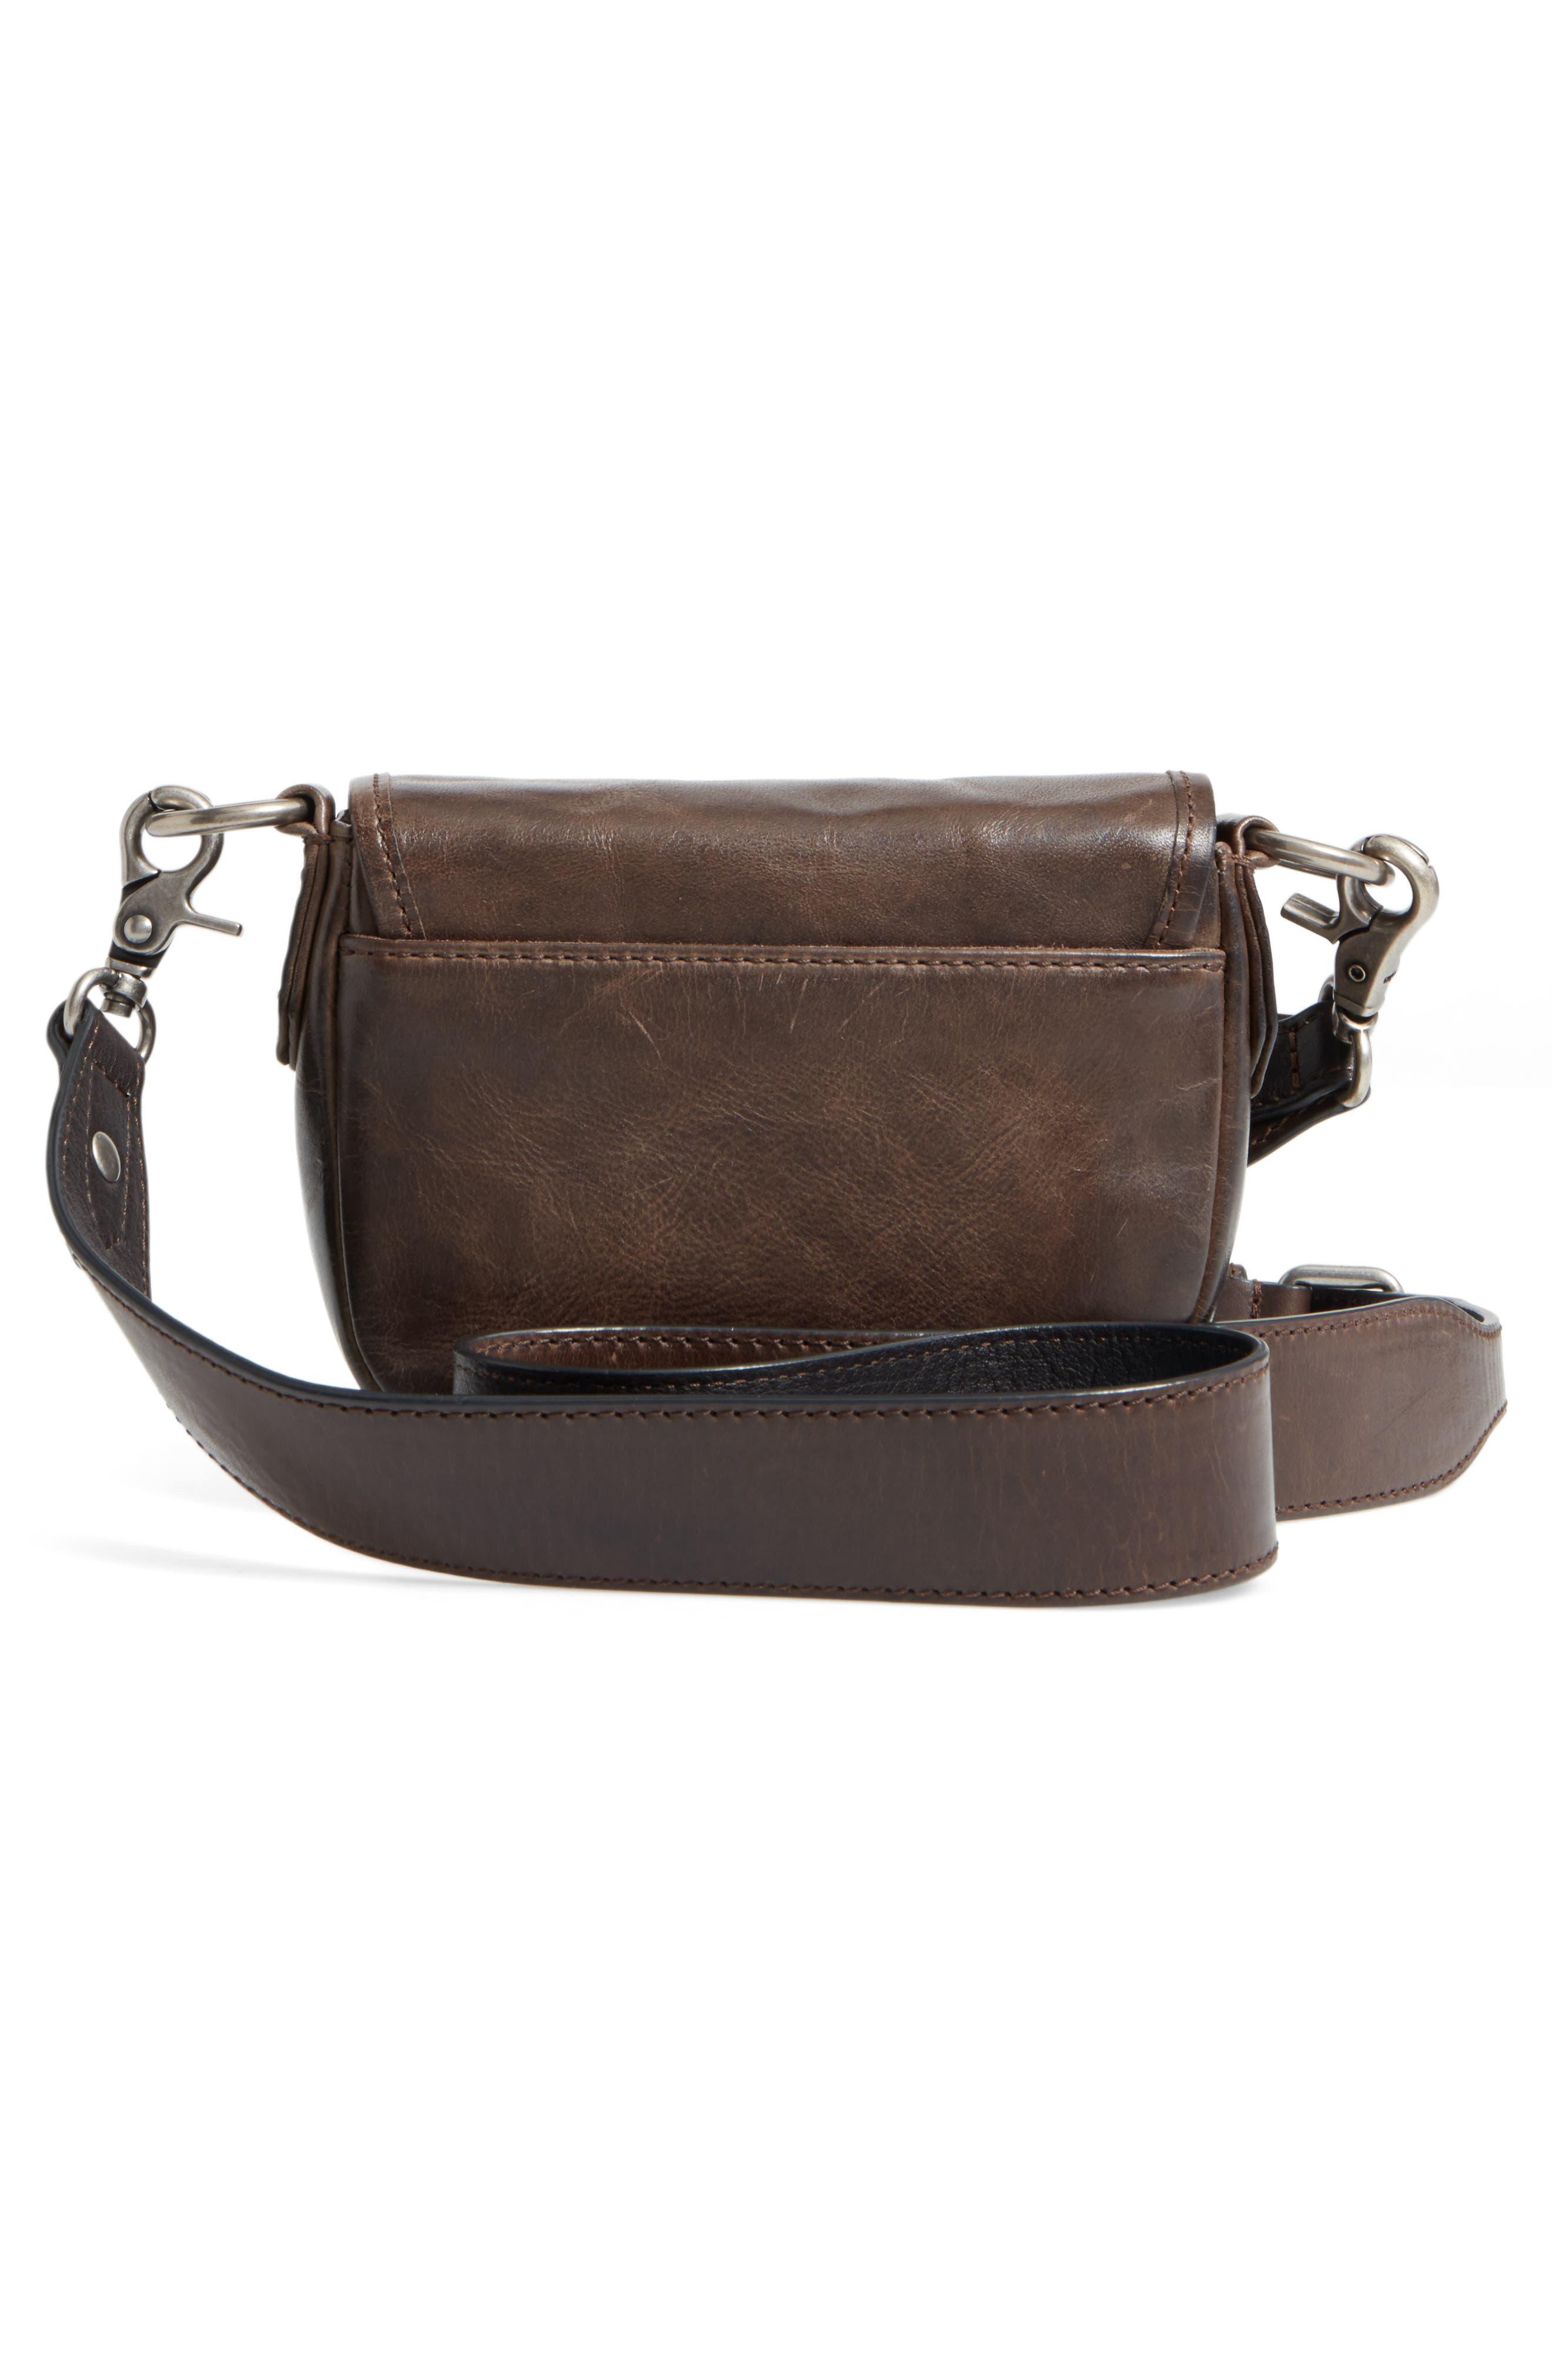 Mini Melissa Whipstitch Leather Saddle Bag,                             Alternate thumbnail 3, color,                             203